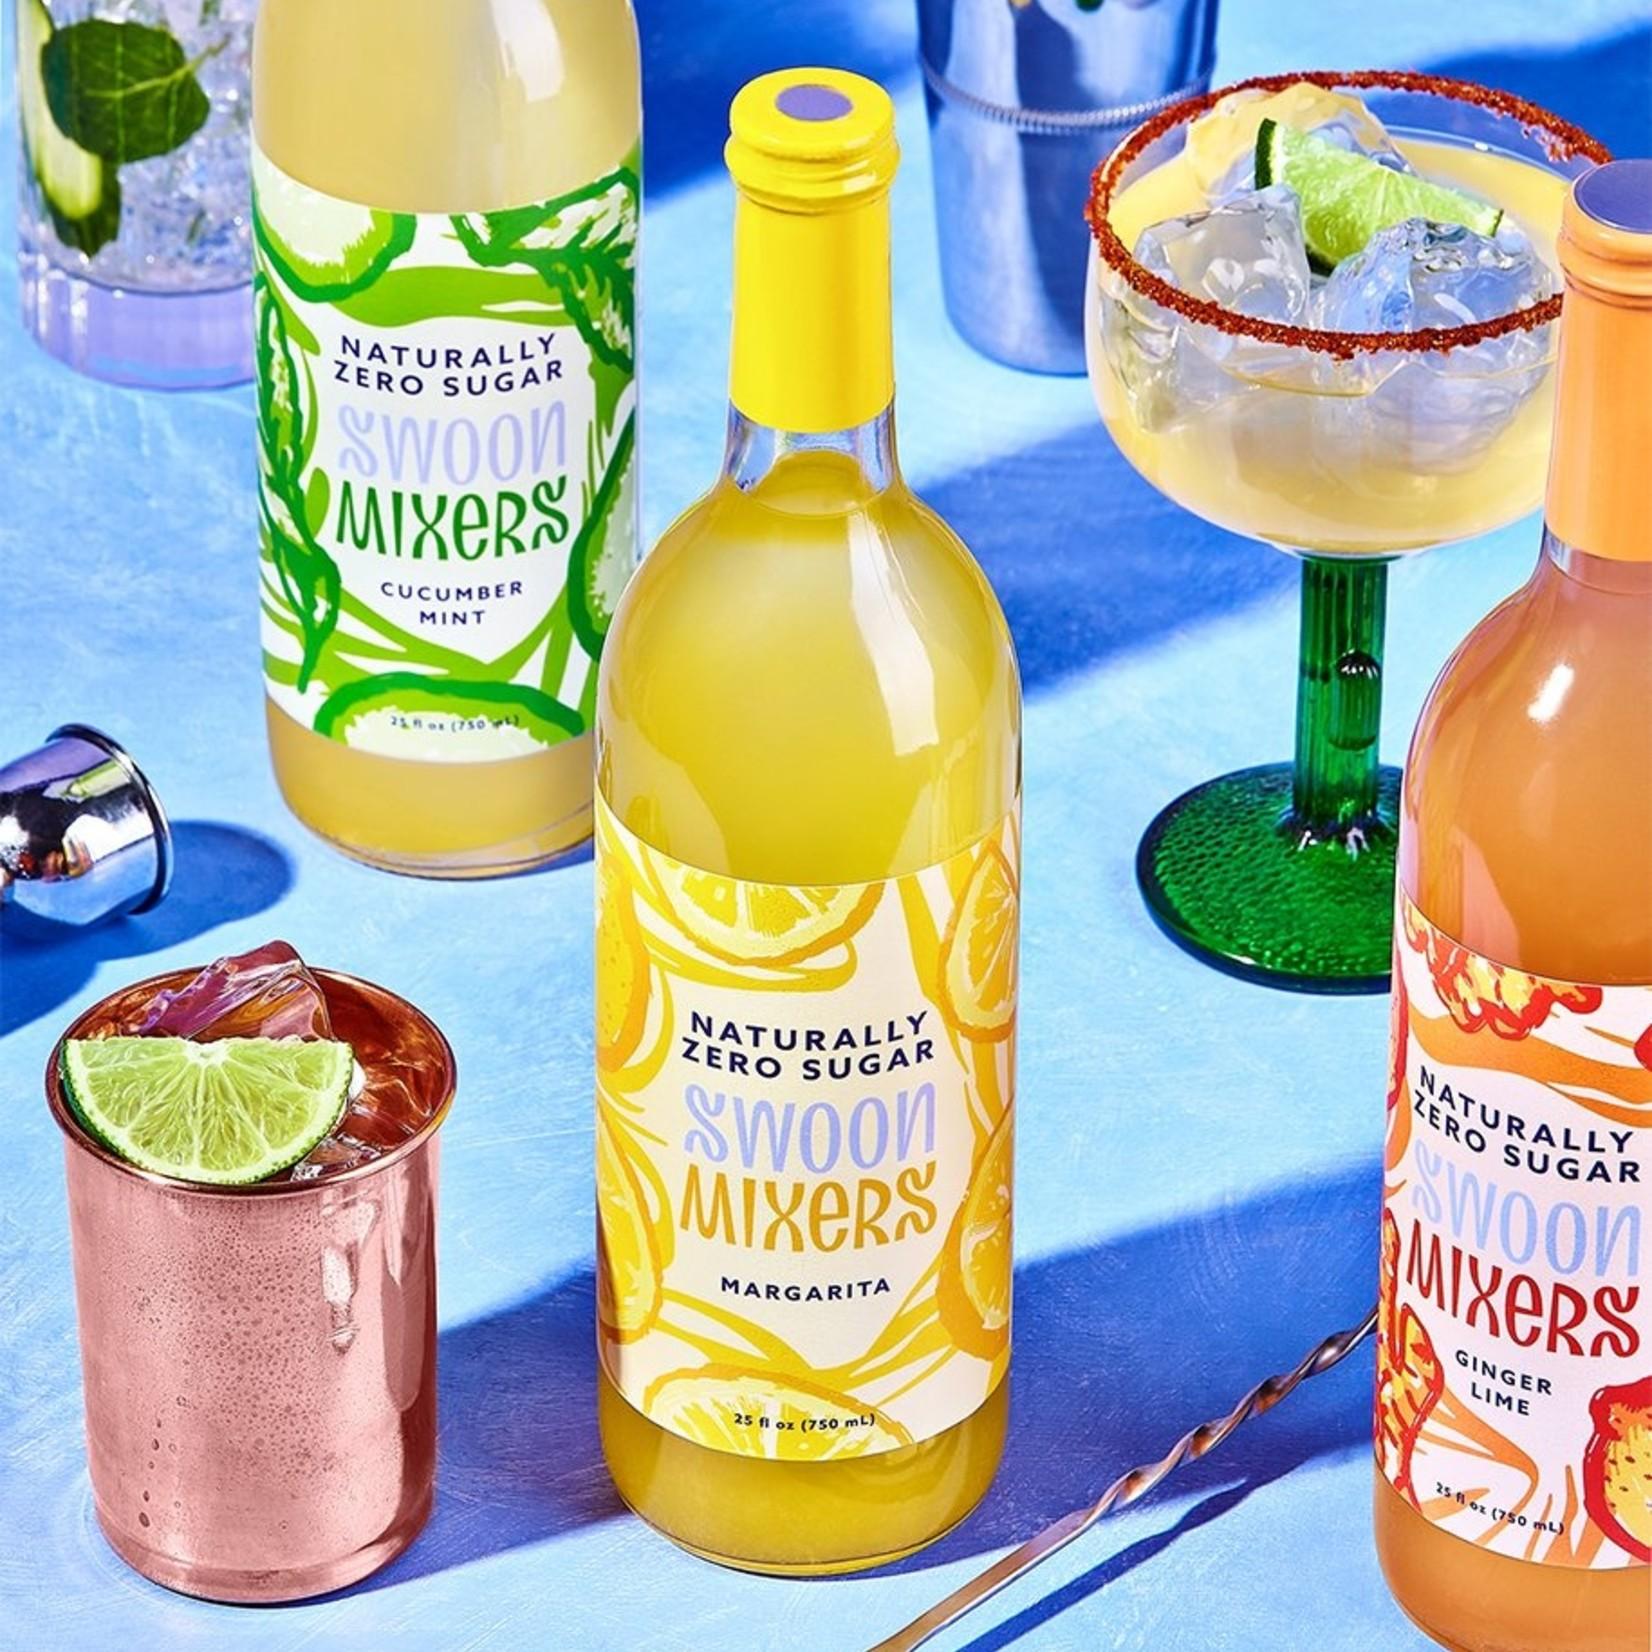 Swoon Naturally Zero Sugar Mixers